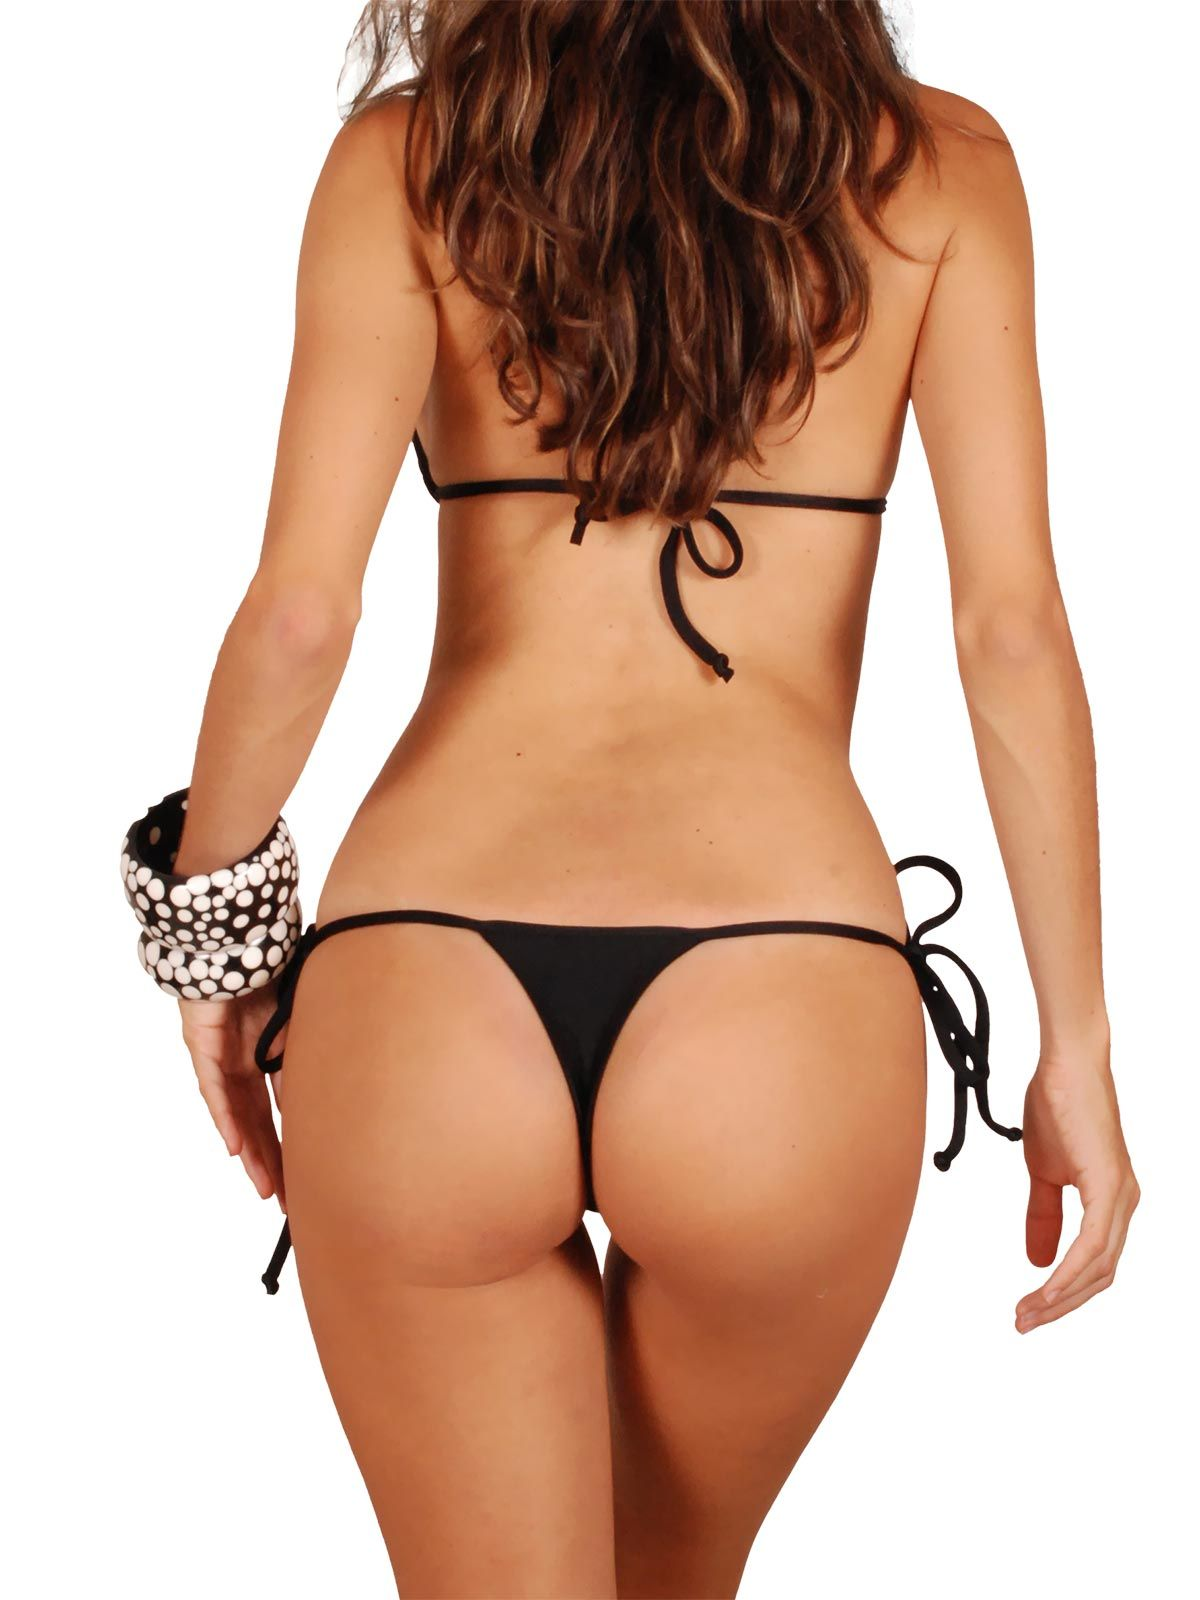 9cfc2111f56 Two Piece Swimwear · Triangle Bikini ·  http://www.brazilianbikinishop.com/en/thong-bikini-